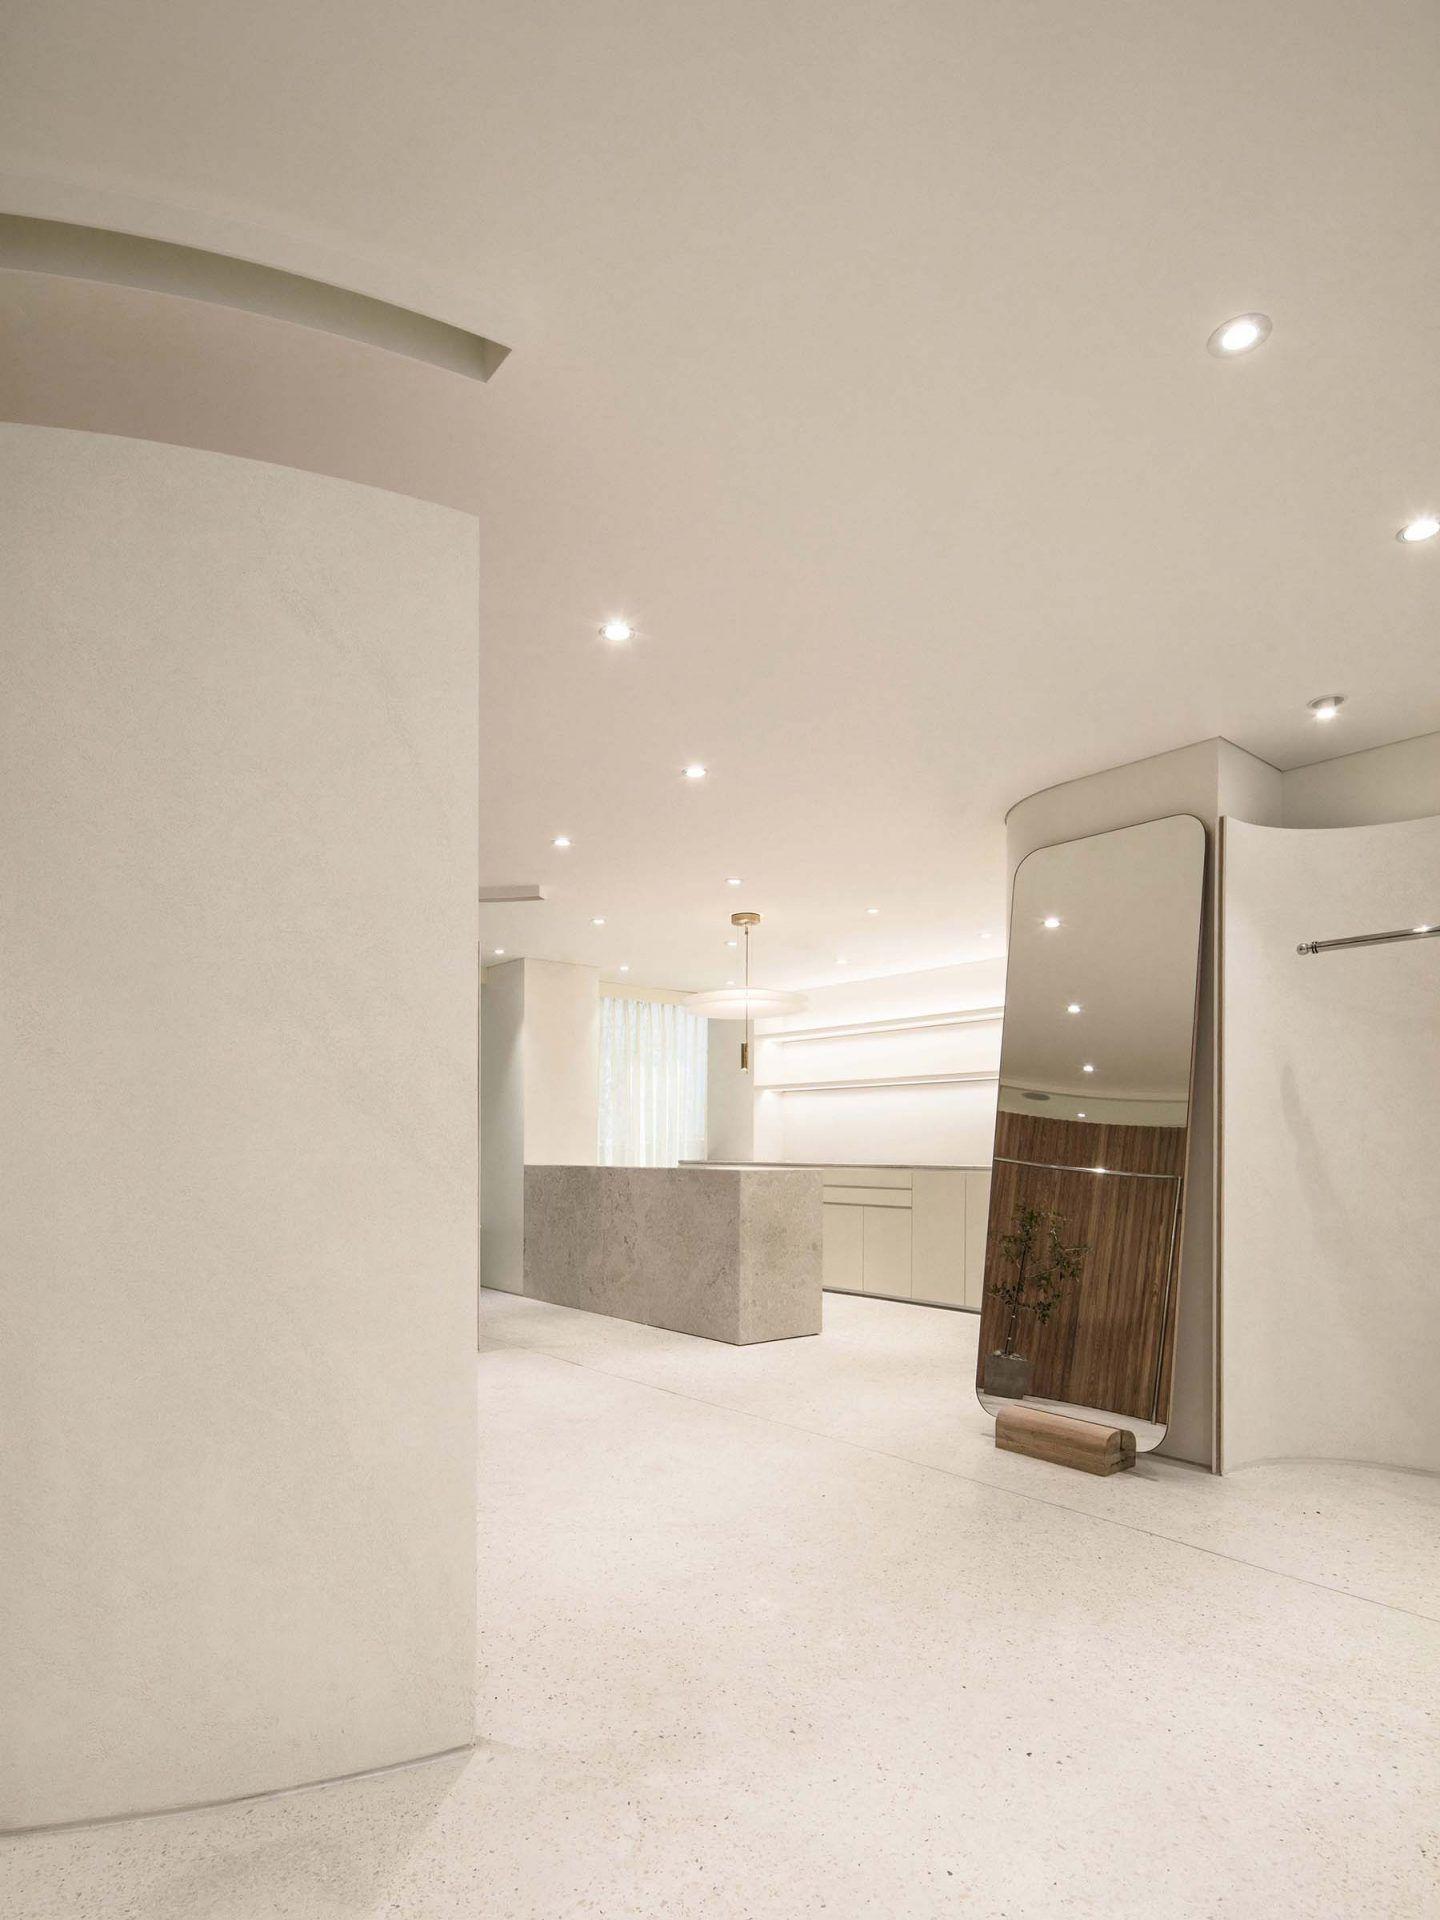 IGNANT-Design-Labotory-Le-Cashmere-4